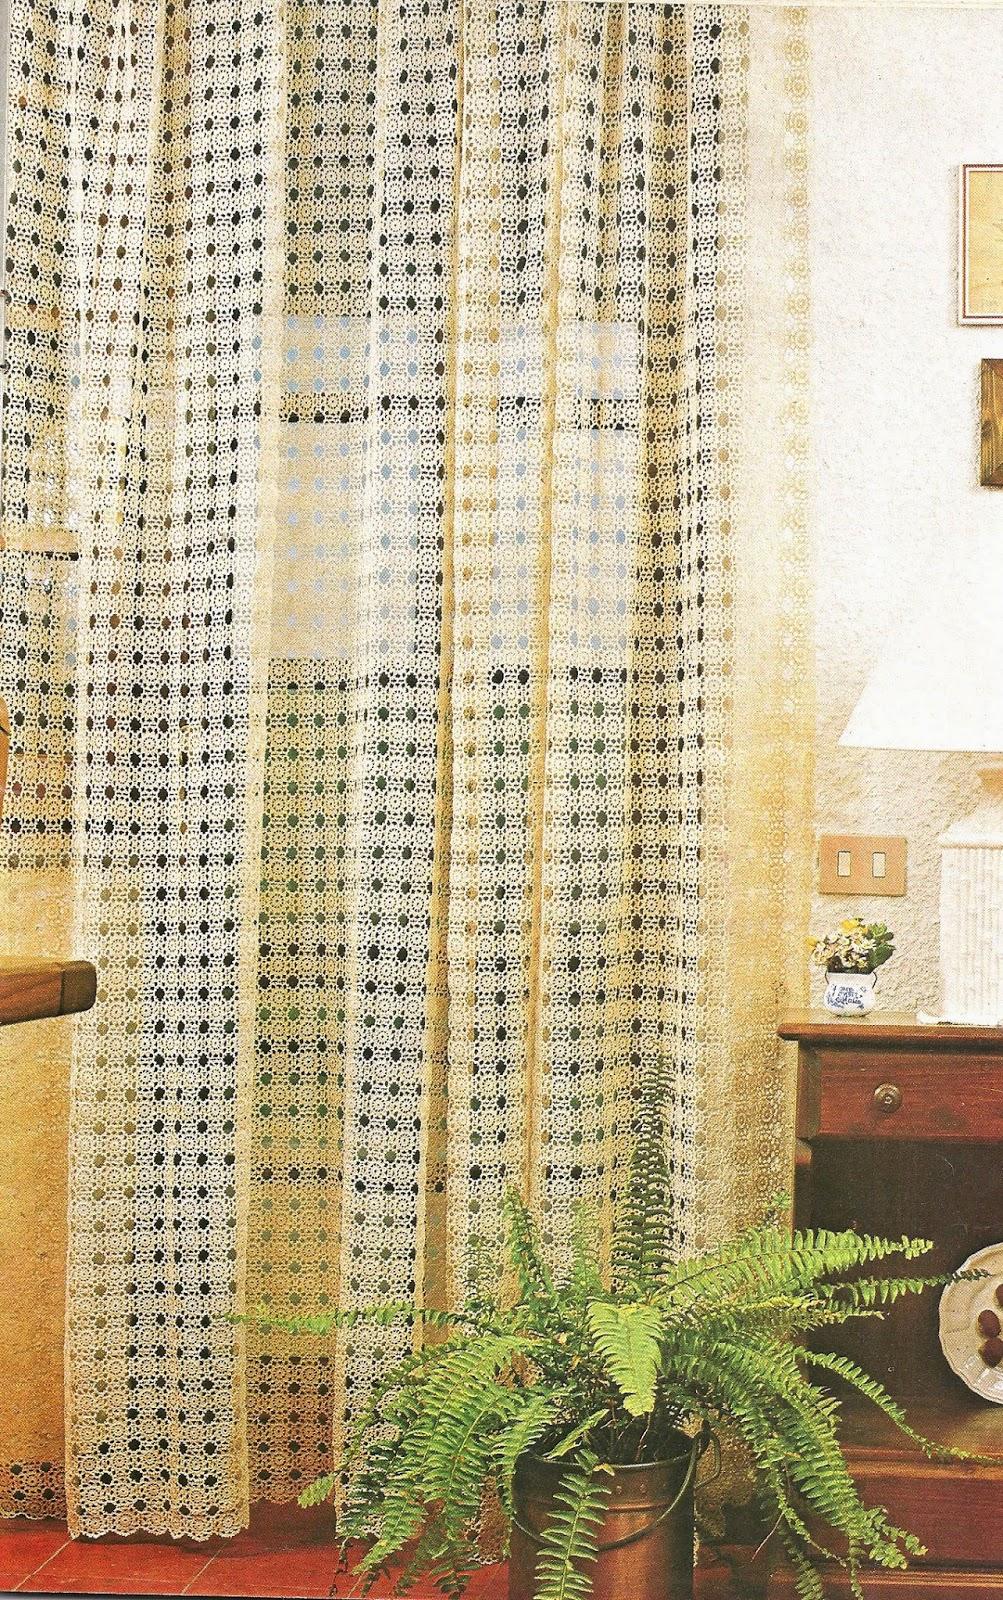 tejidos artesanales en crochet cortina tejida en crochet